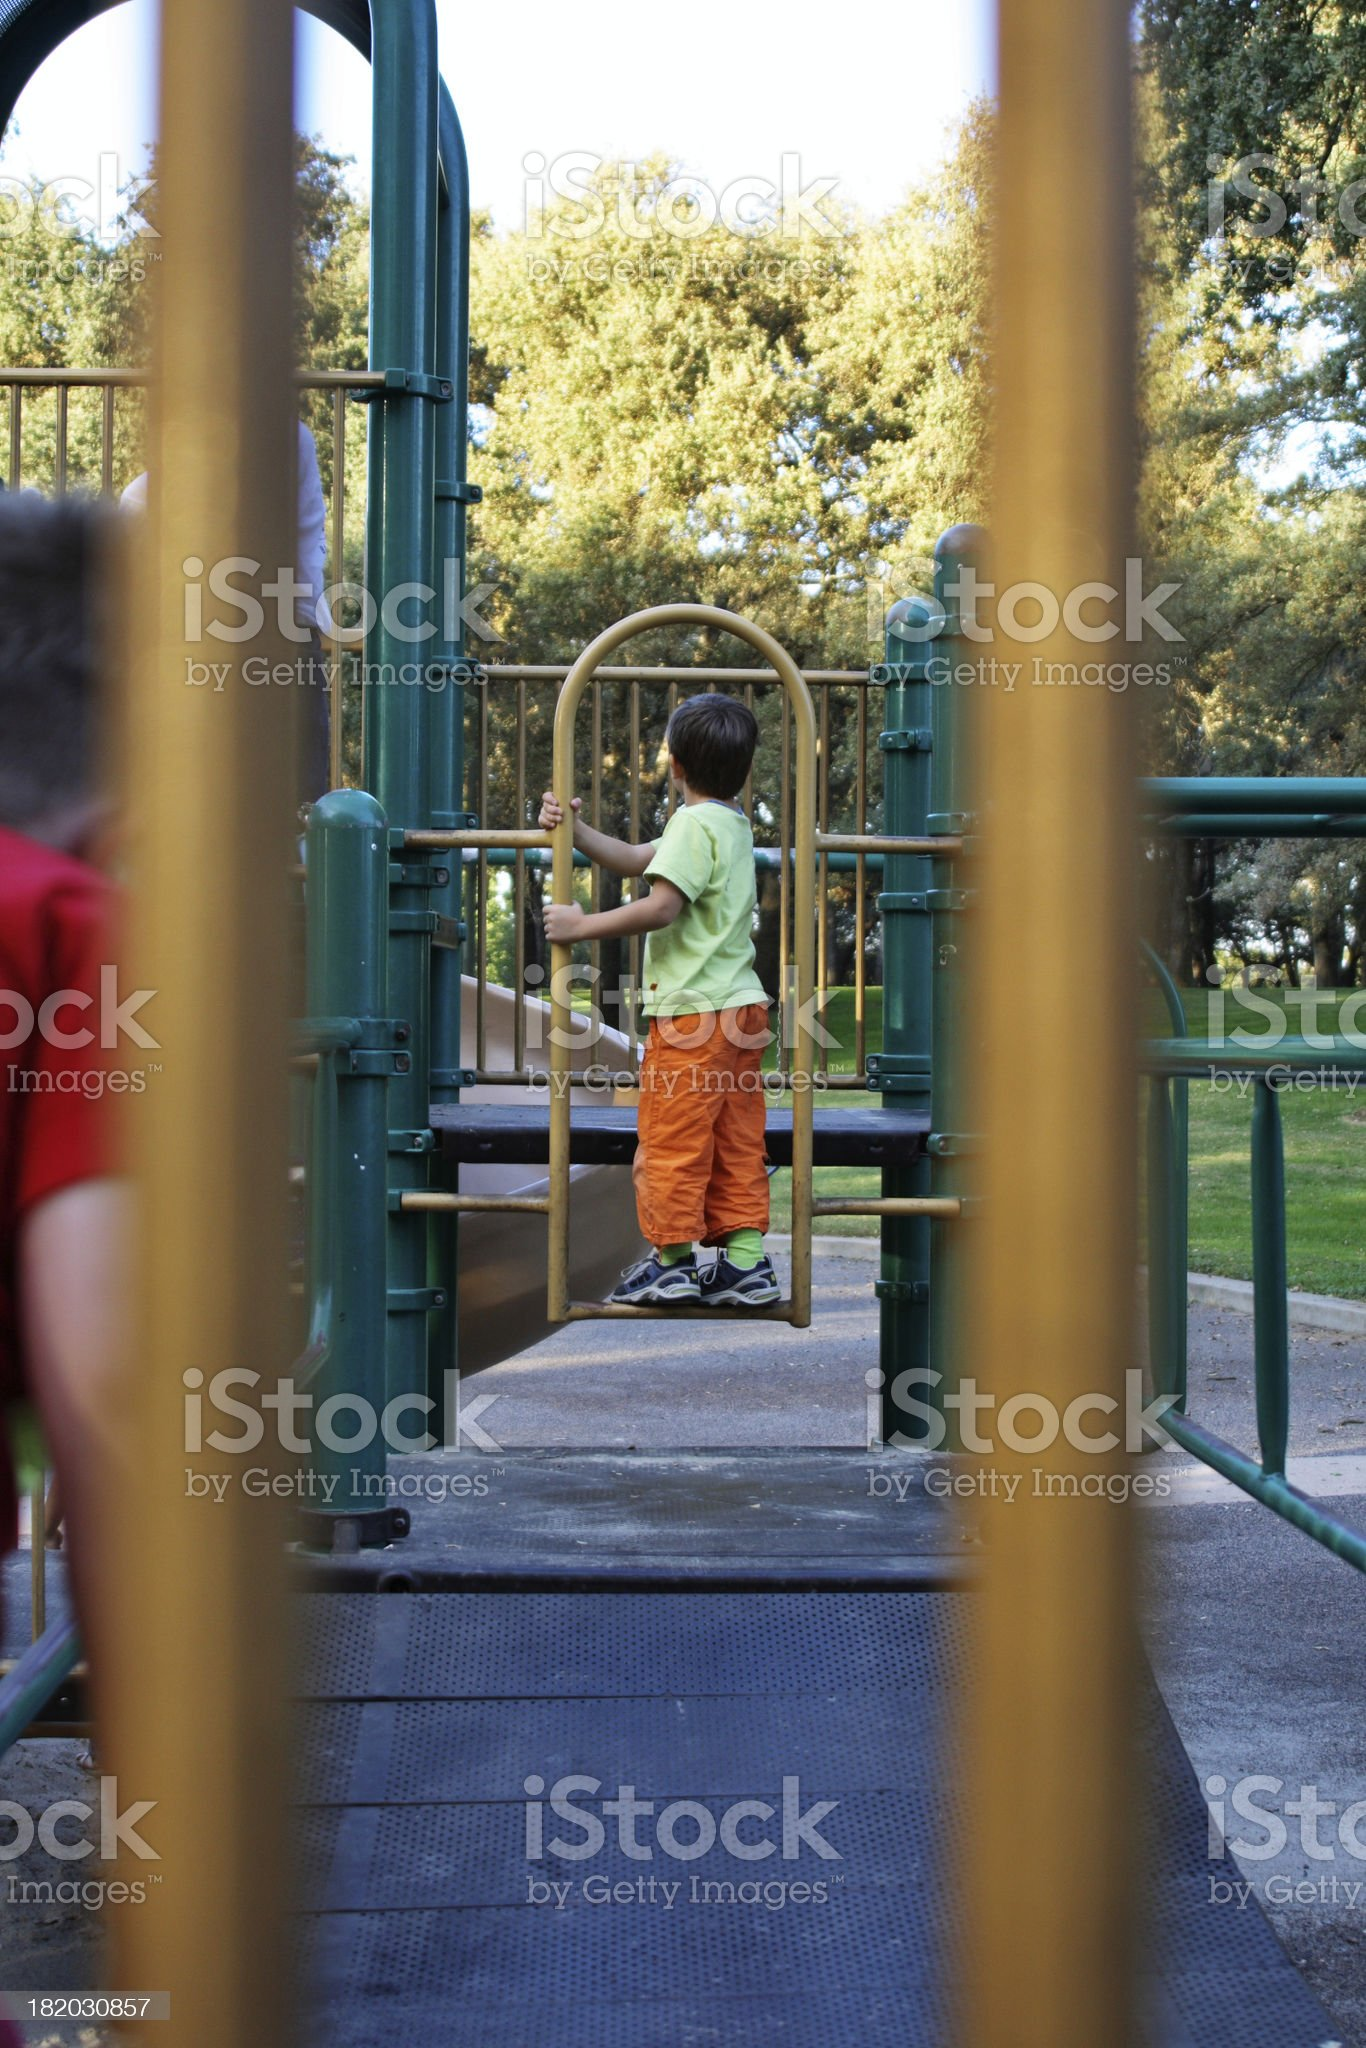 Playground and Children royalty-free stock photo